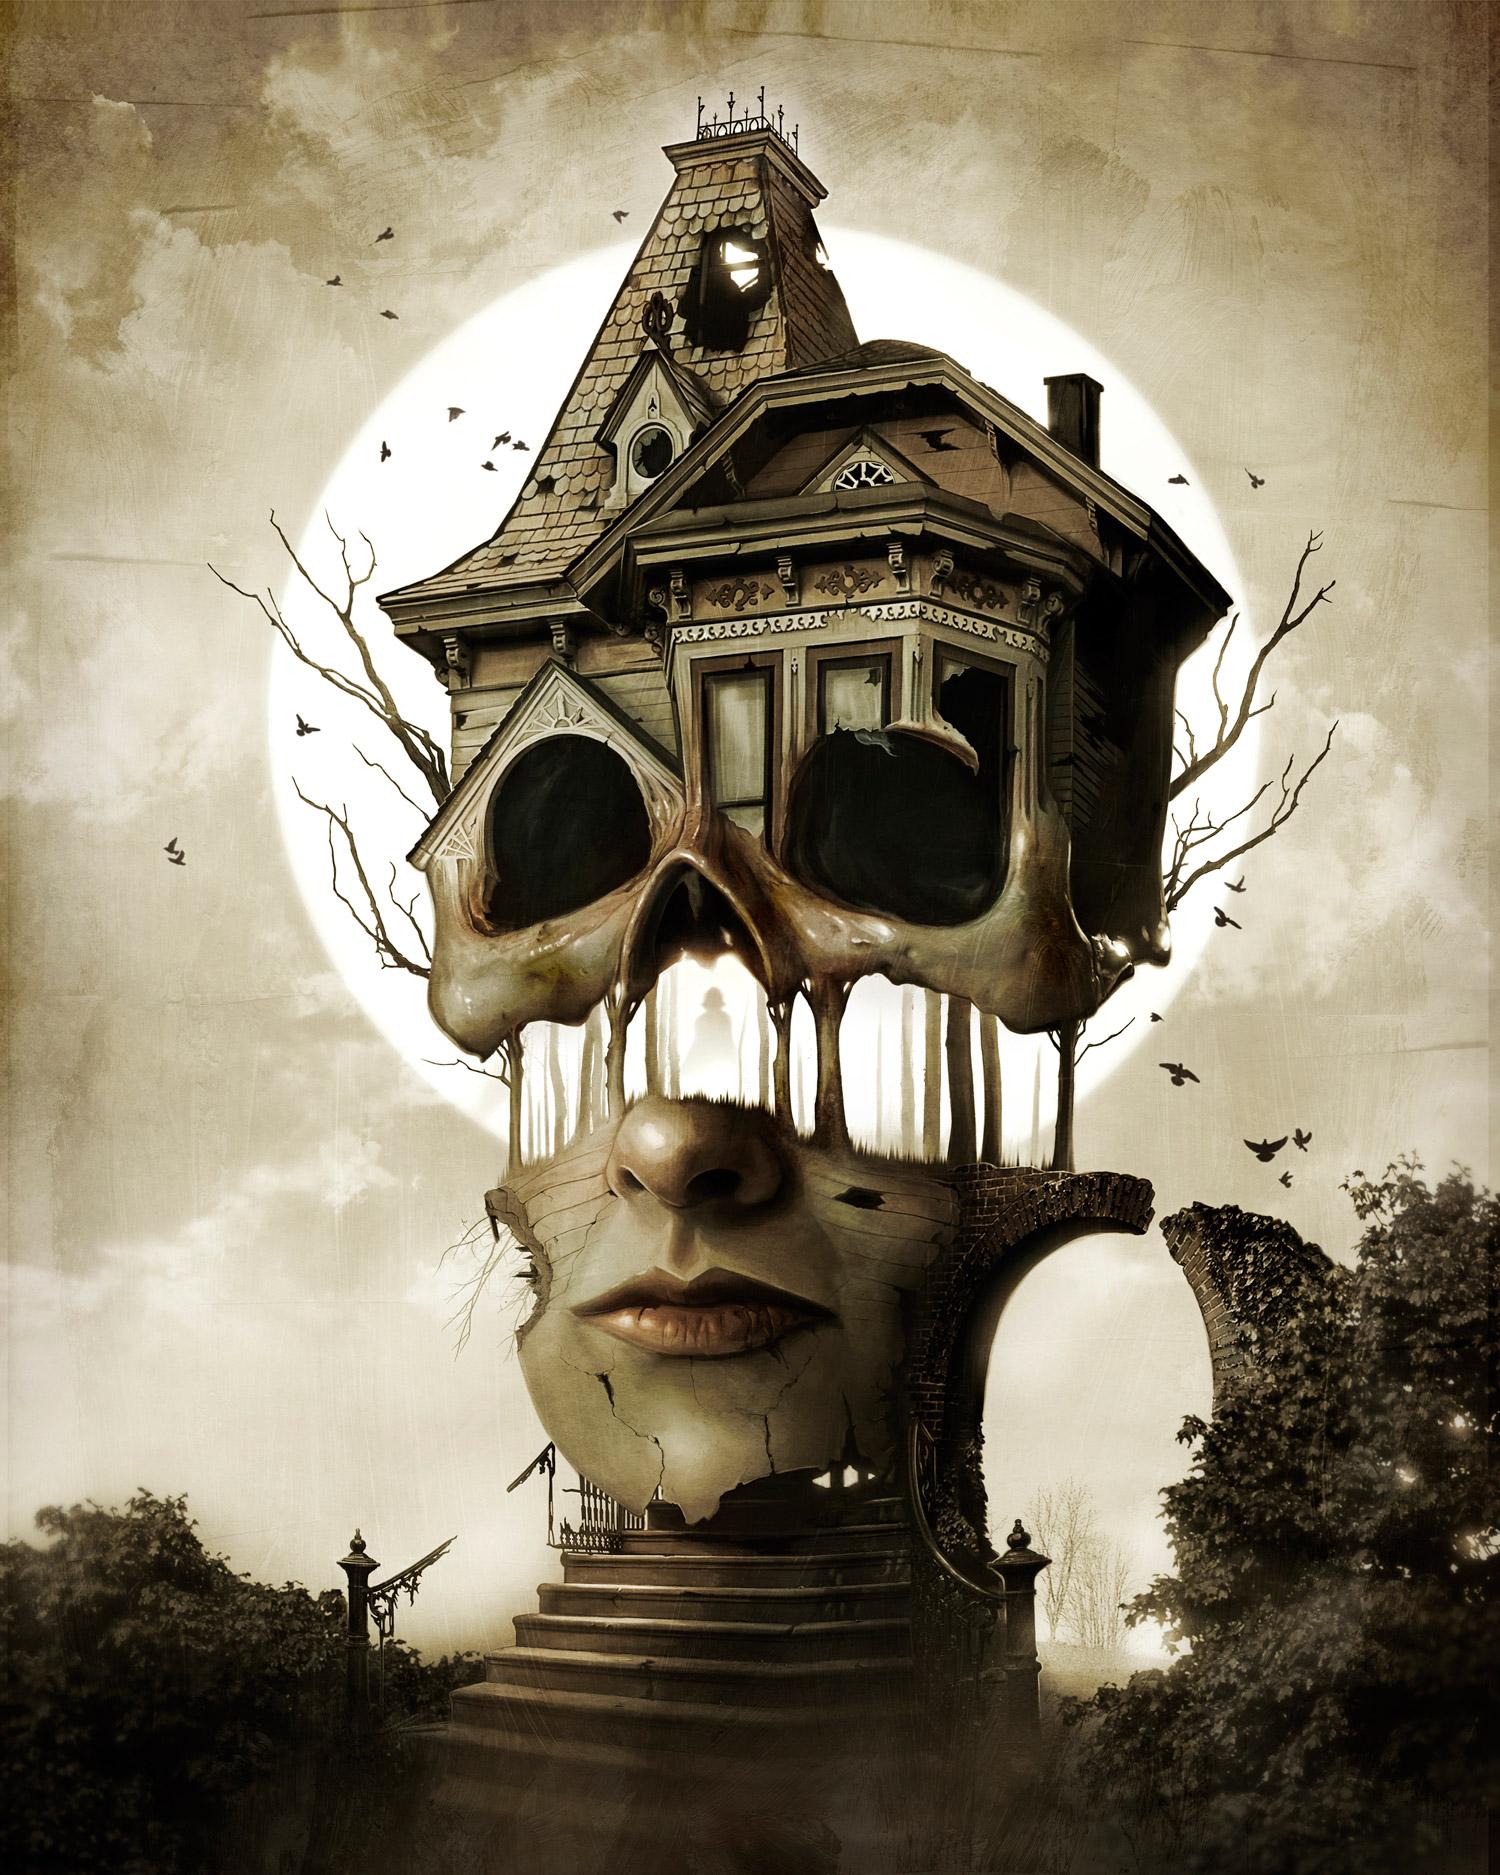 David Seidman - Haunted